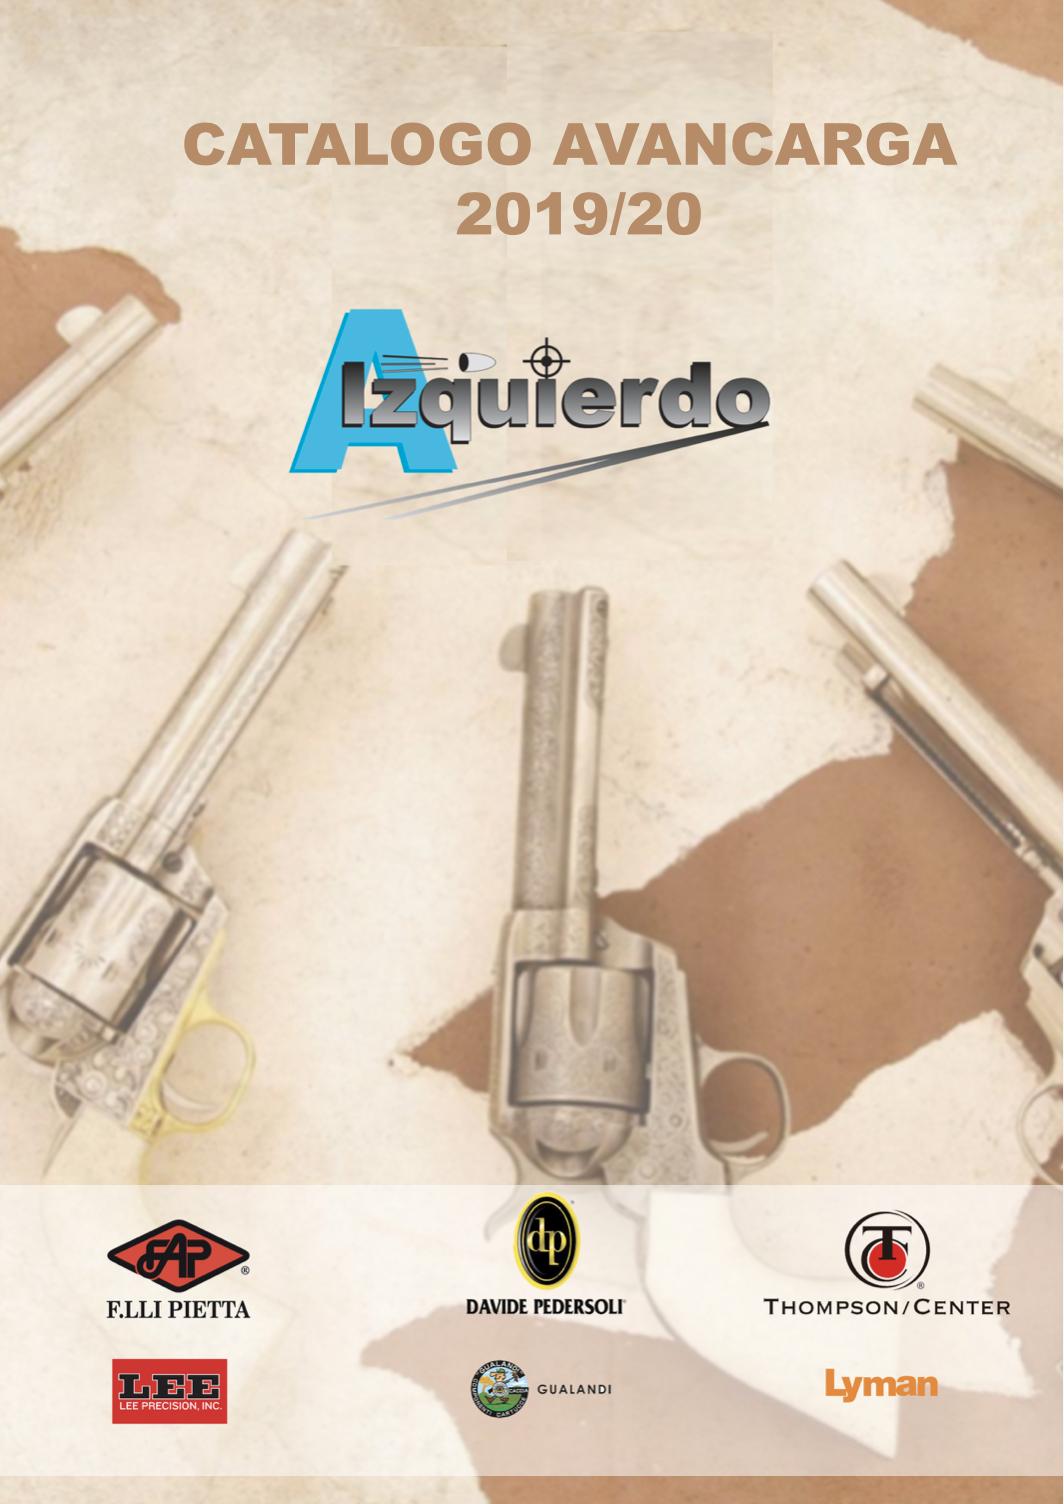 Catalogo Avancarga 2019